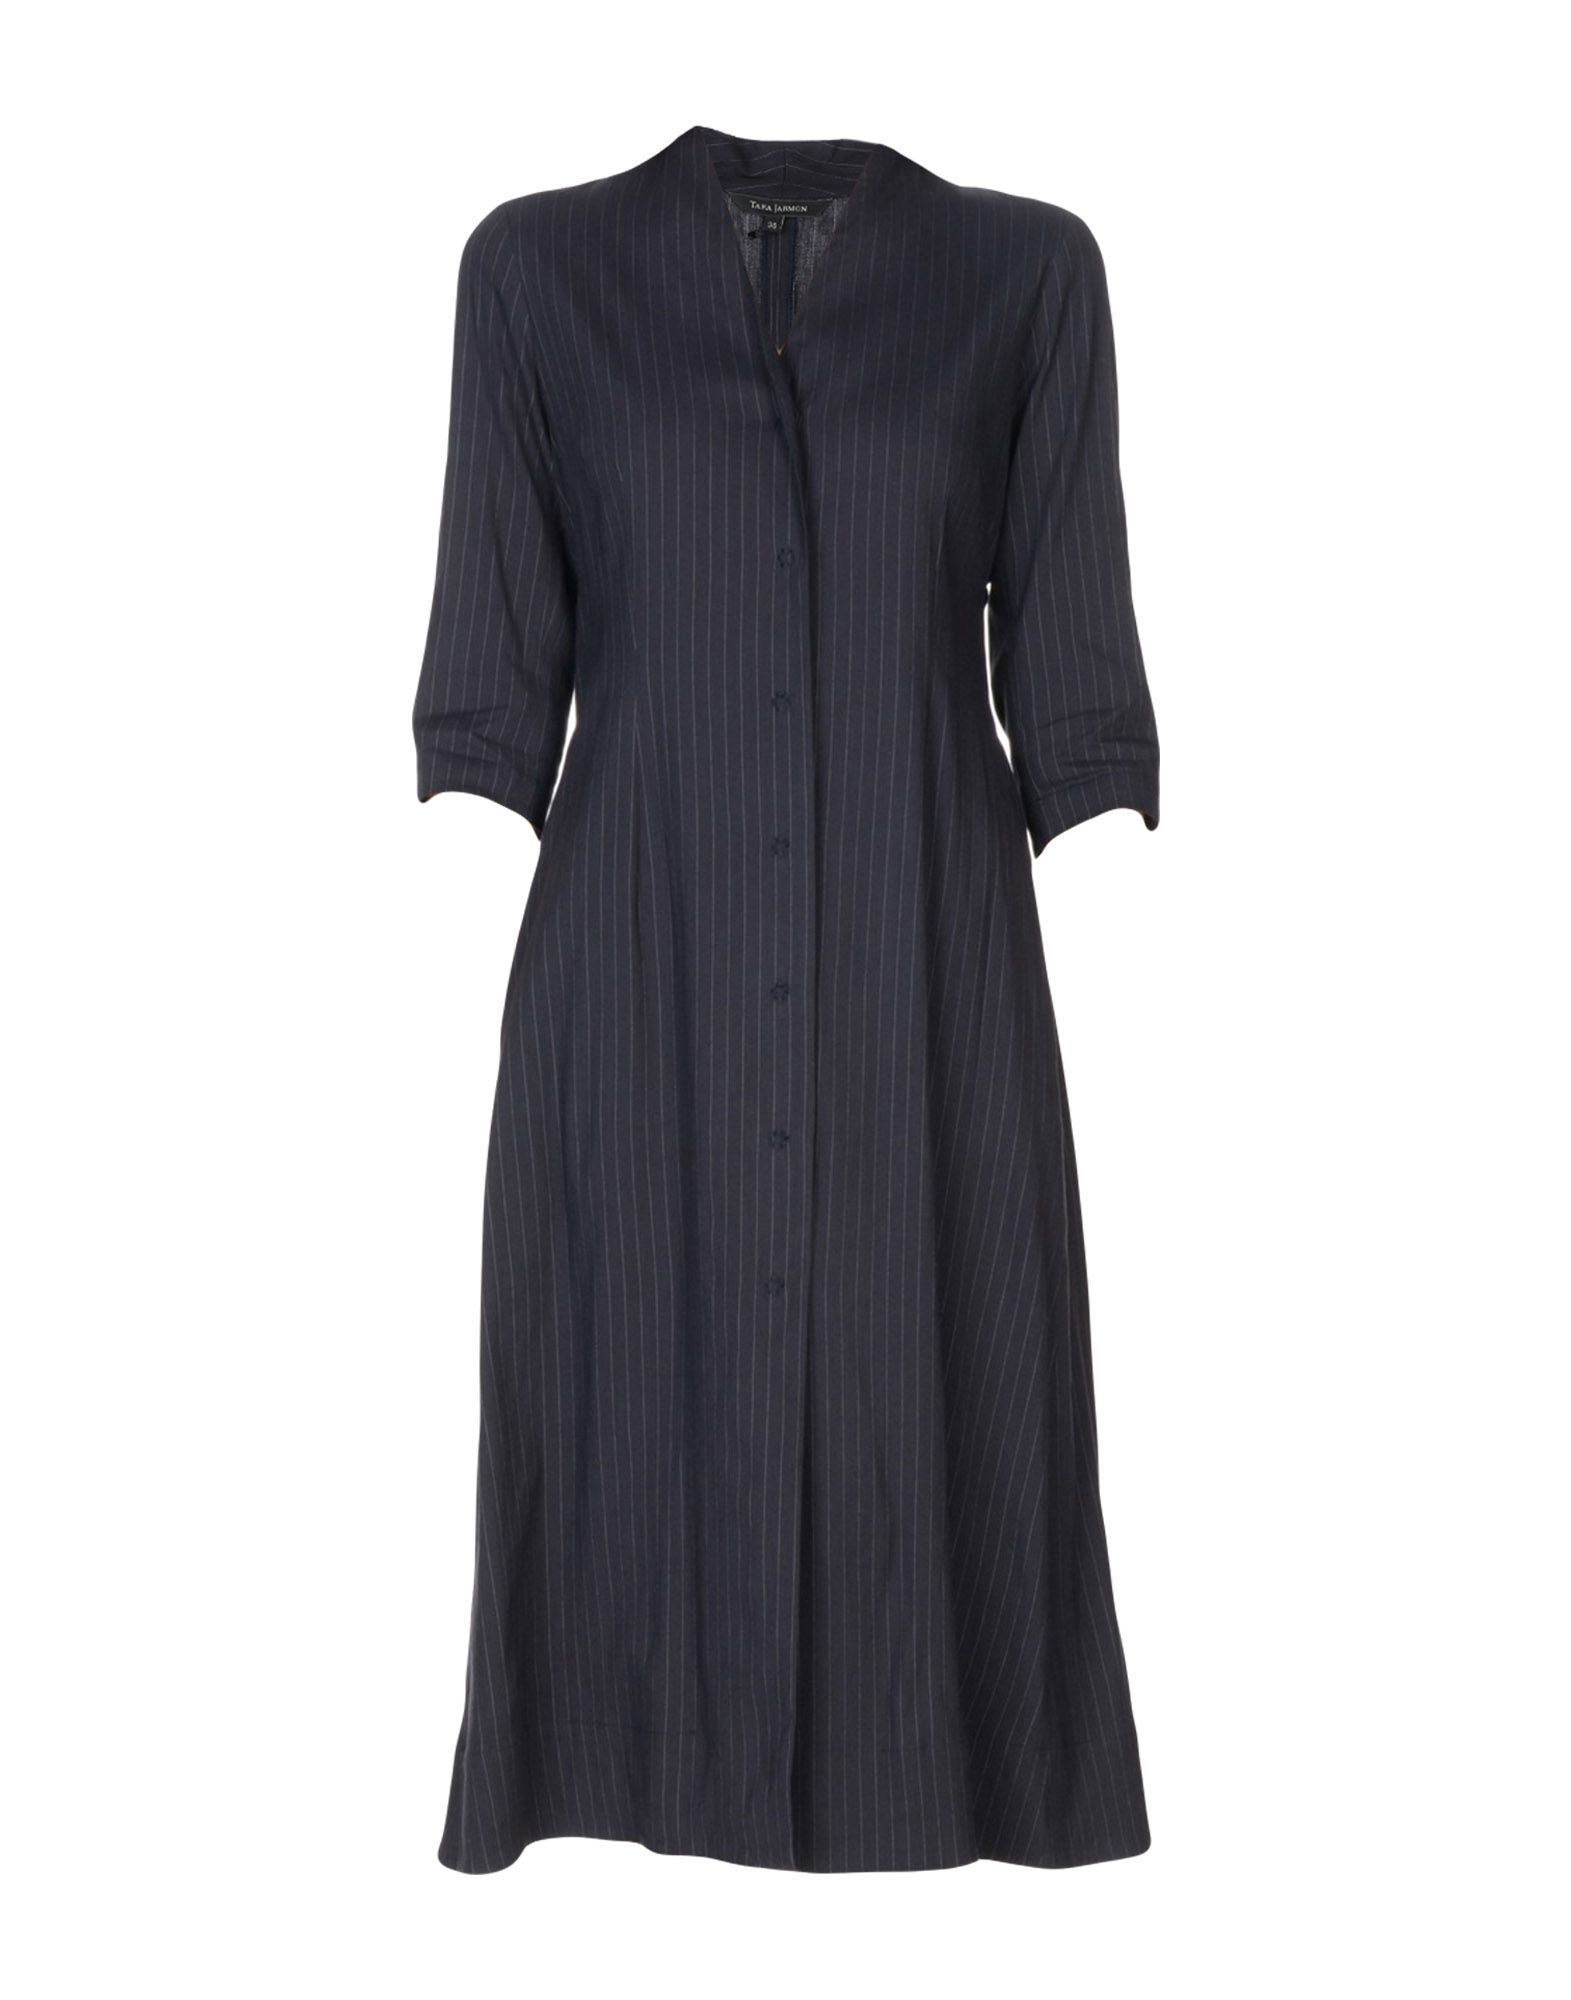 TARA JARMON Платье длиной 3/4 lisa corti платье длиной 3 4